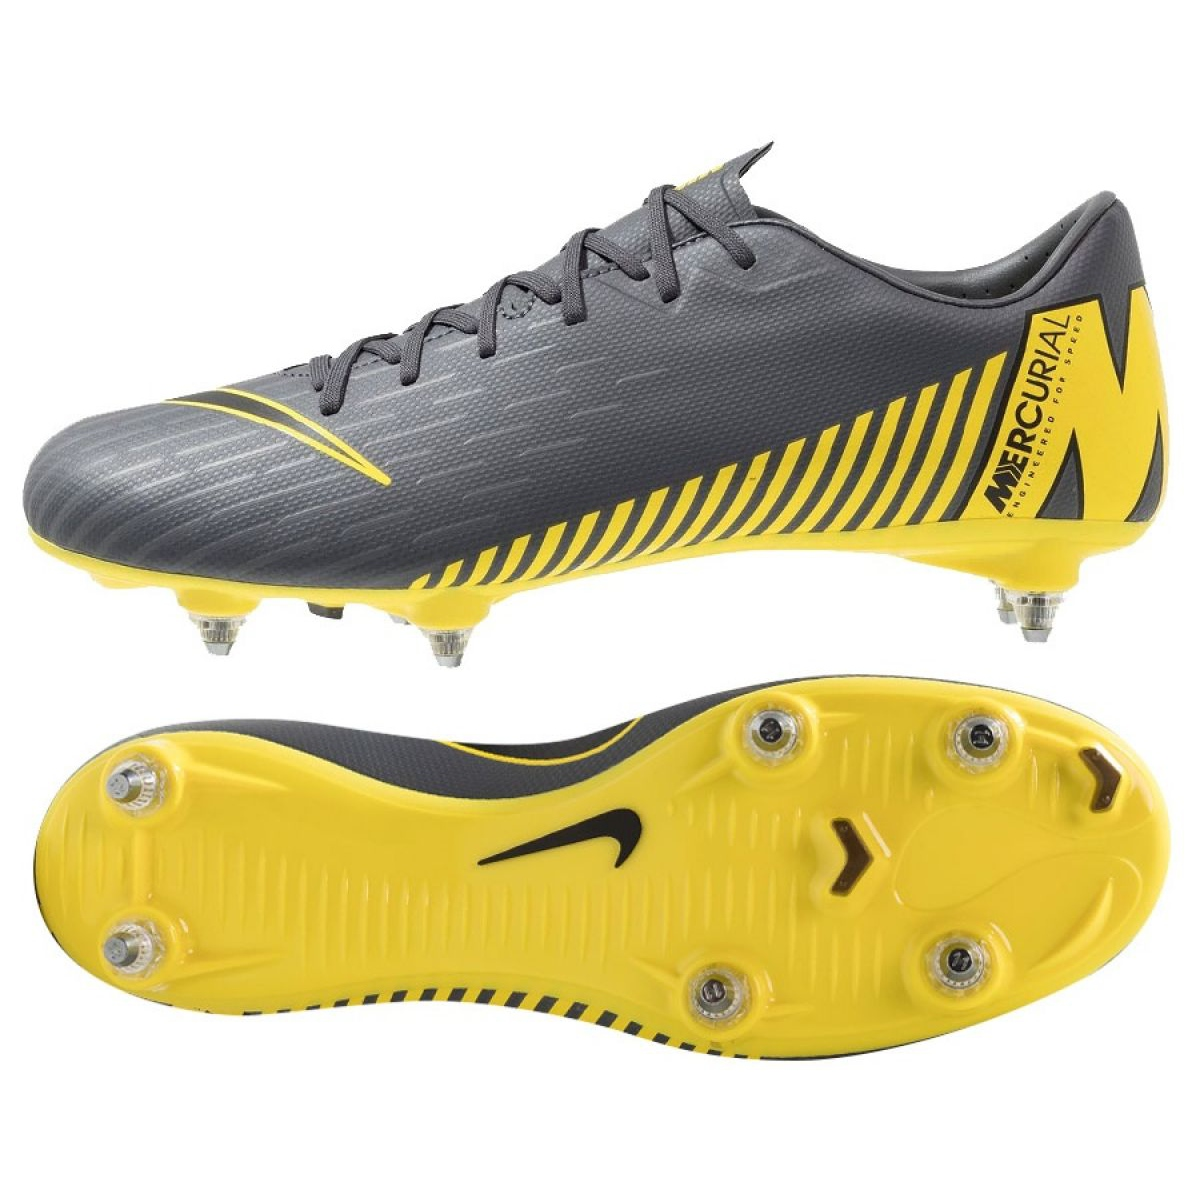 Details about Nike Mercurial Vapor 12 Academy Sg Pro M AH7376 070 Football Shoes black black